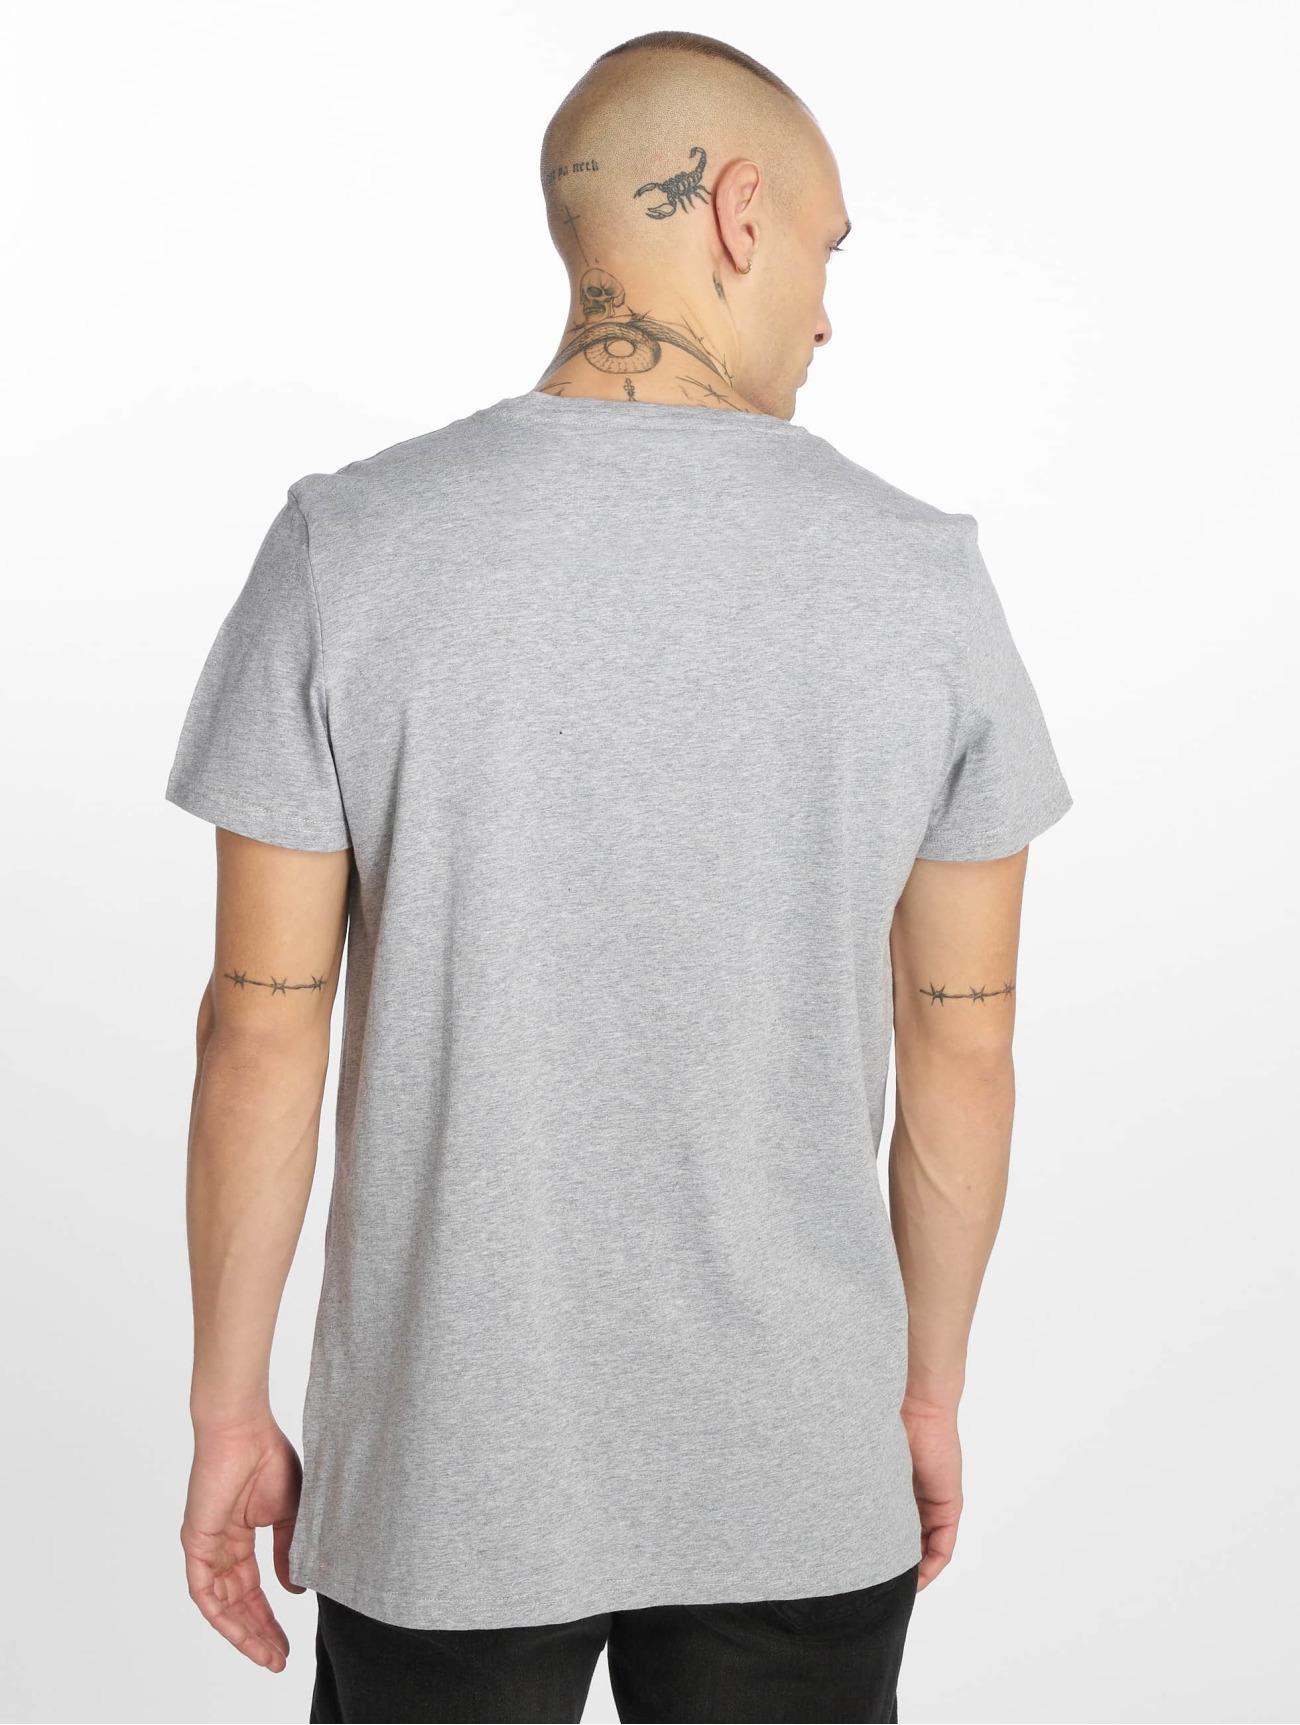 Sixth June | Wyoming Propaganda  gris Homme T-Shirt  603411| Homme Hauts